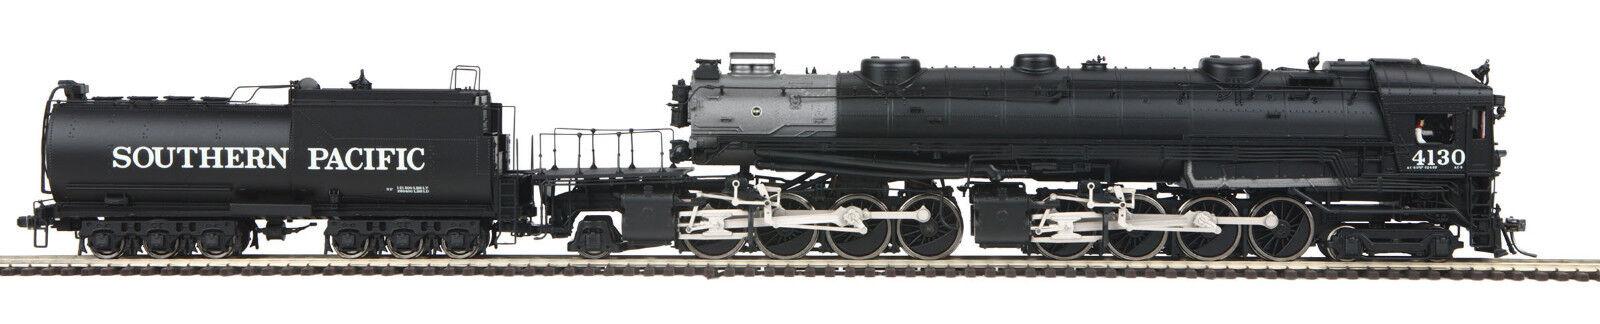 HO MTH Die-Cast SP Cab Forward 2 Rail Rail Rail DC w/DCC, Sound, Smoke 80-3274-1 b0296b